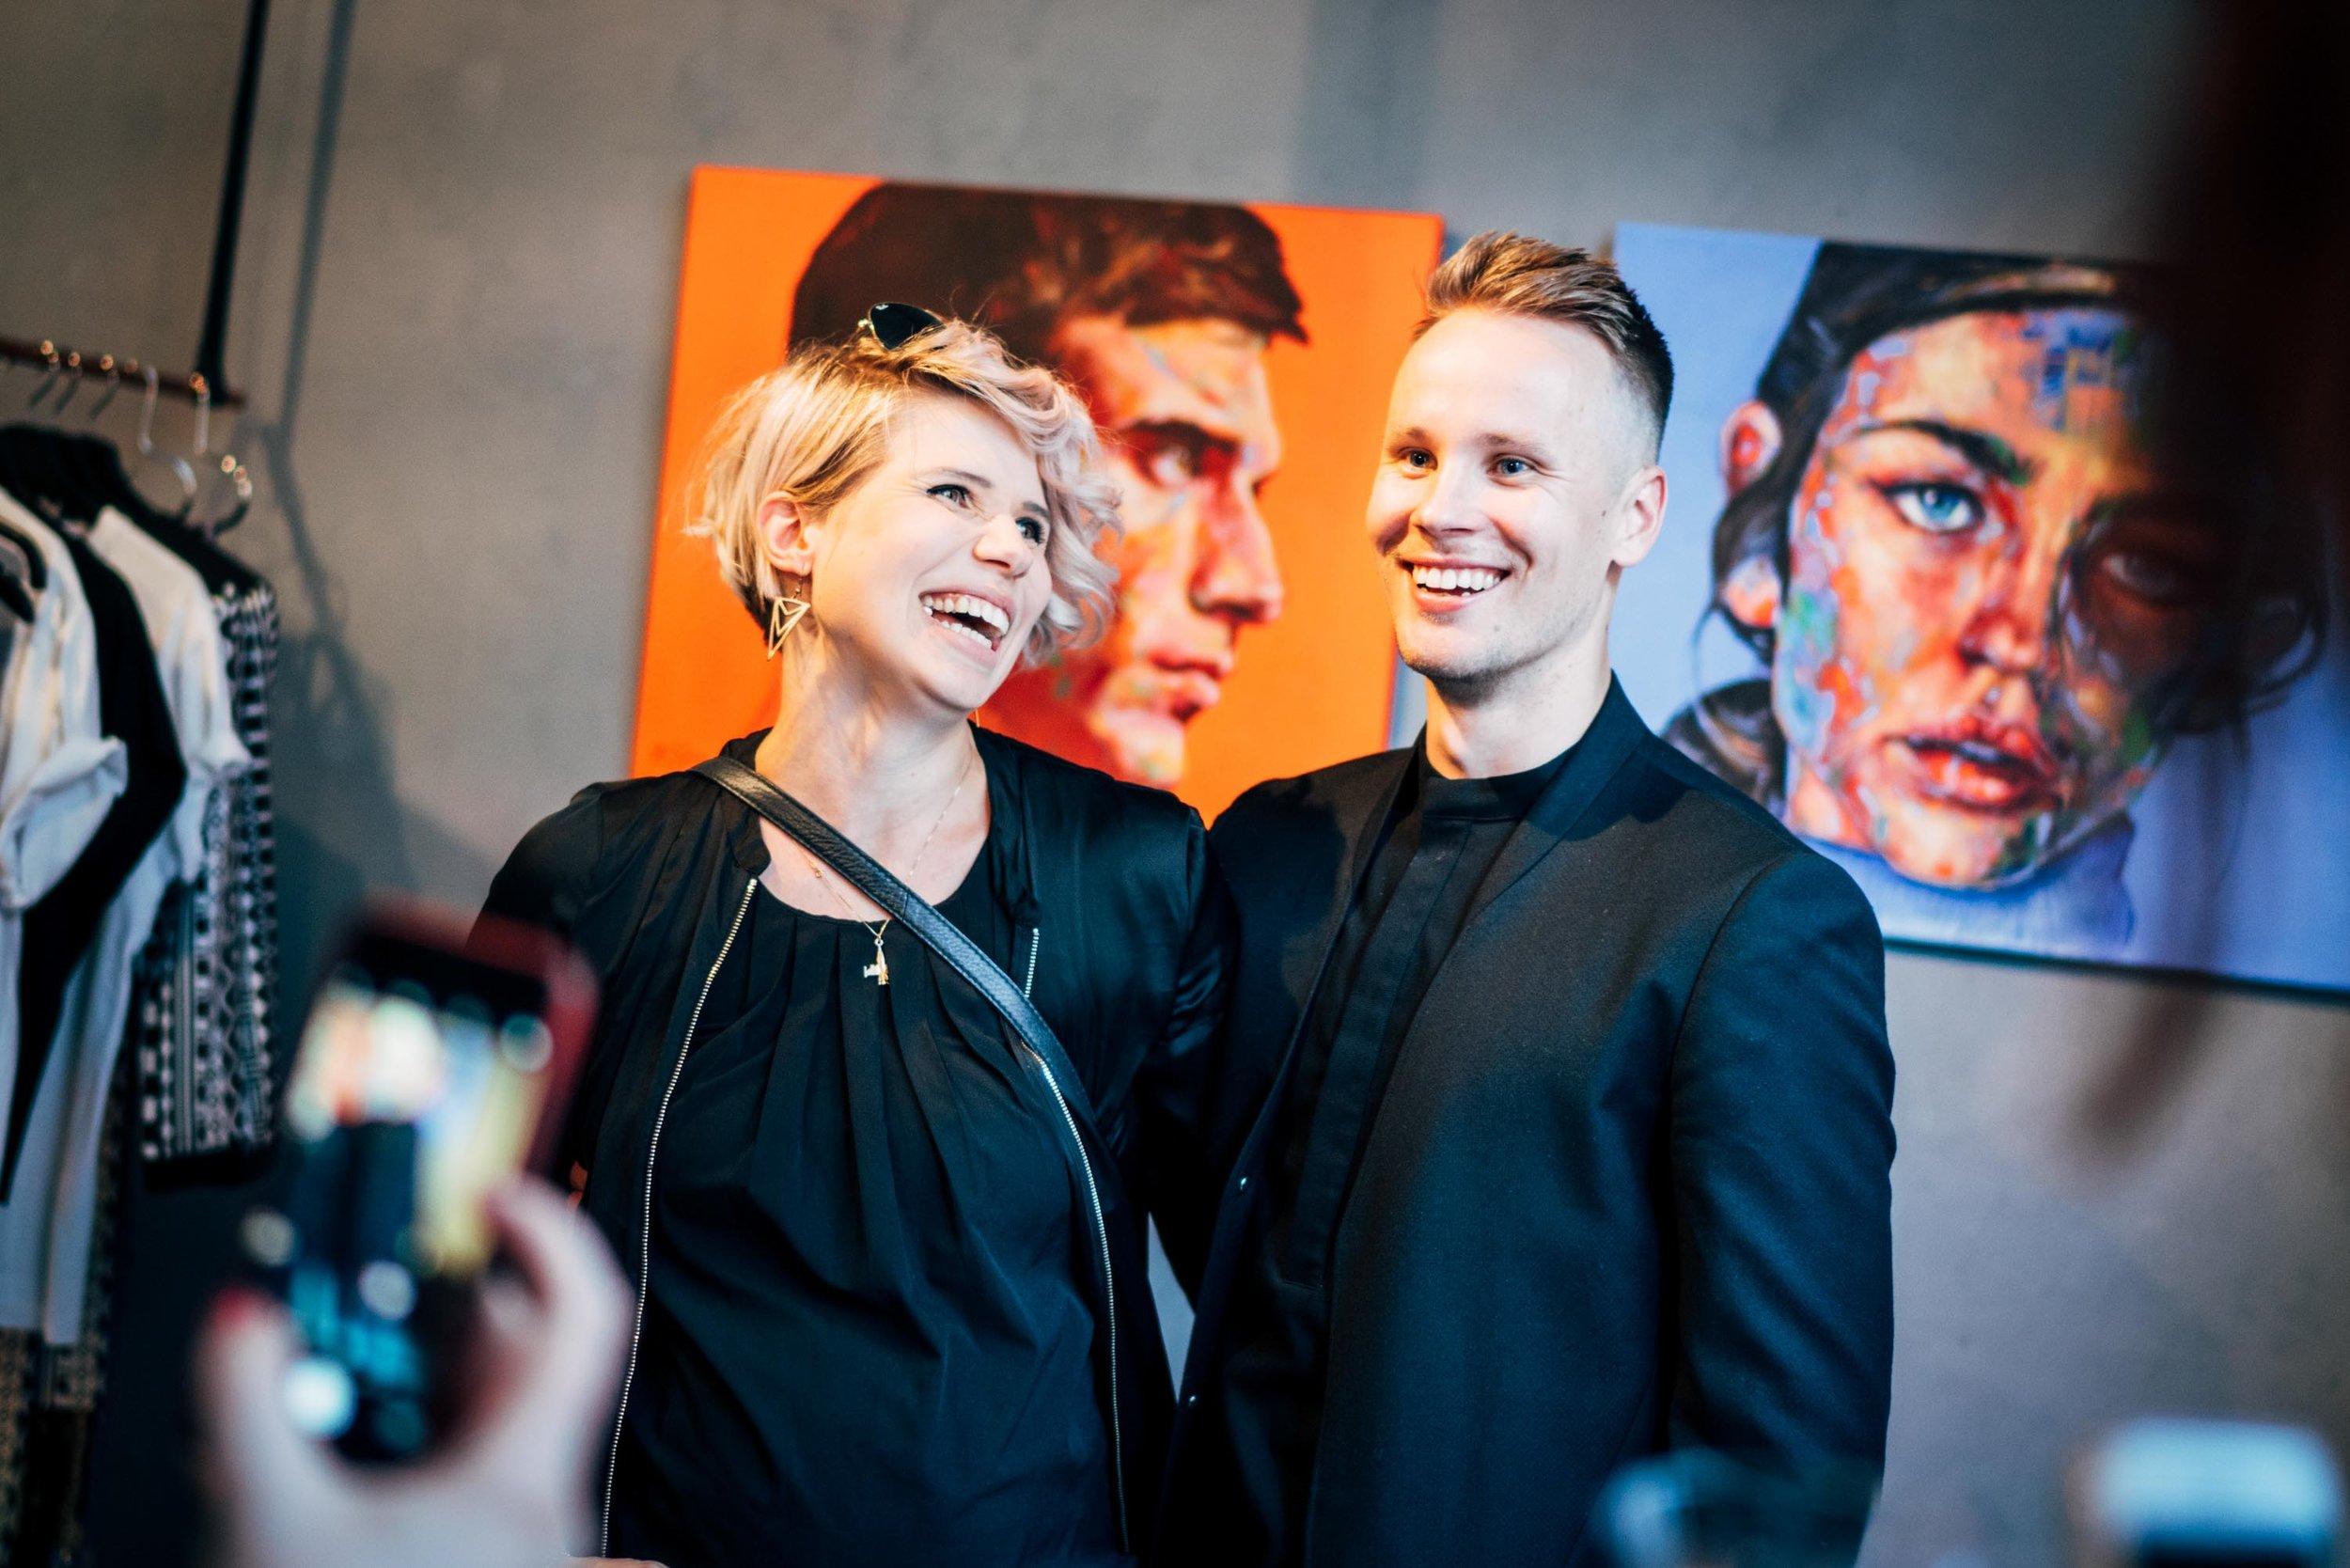 ville-sivonen-exhibition-01600.jpg